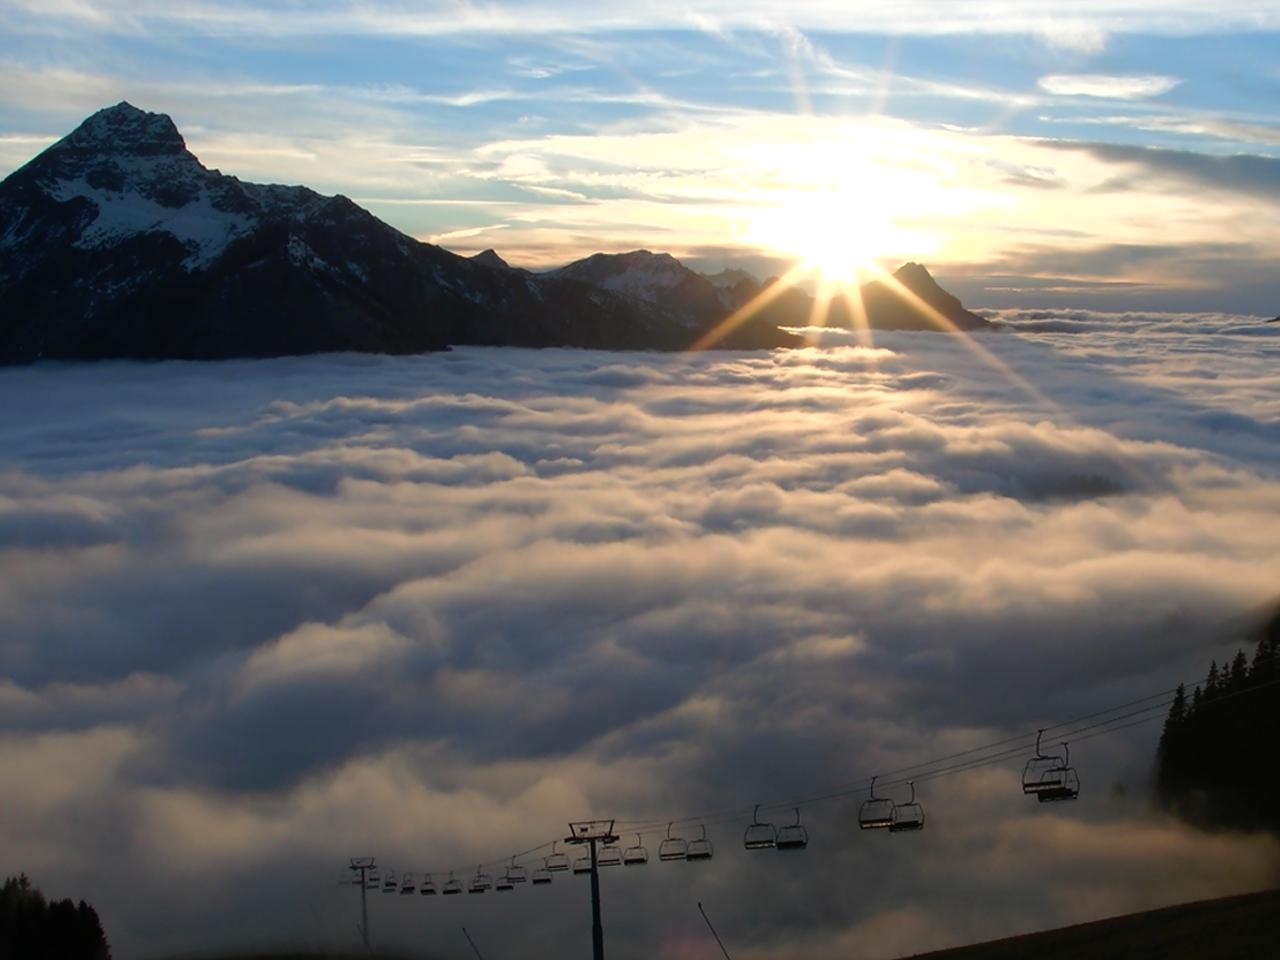 Omgeving - Ondergaande zon met skilift en wolken